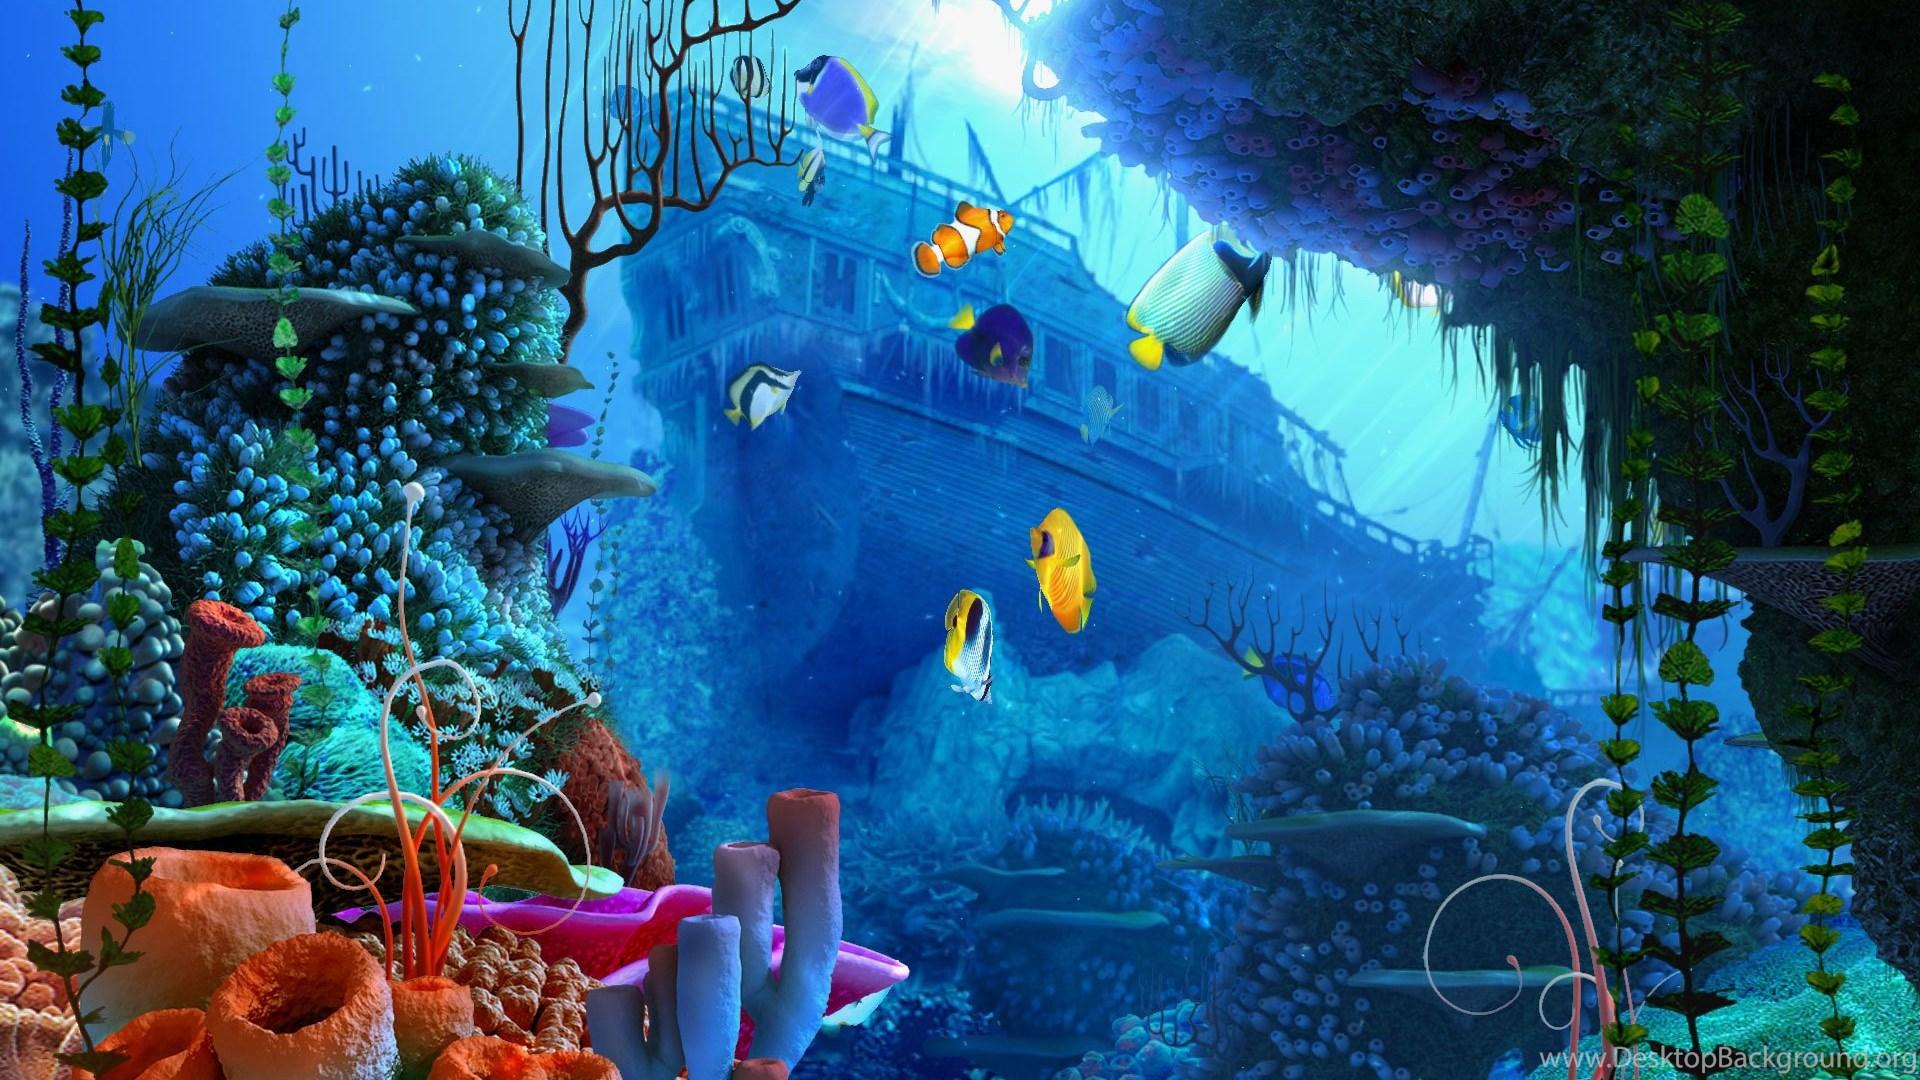 Hd Aquarium Fish Tank Computer Wallpapers Full Size Desktop